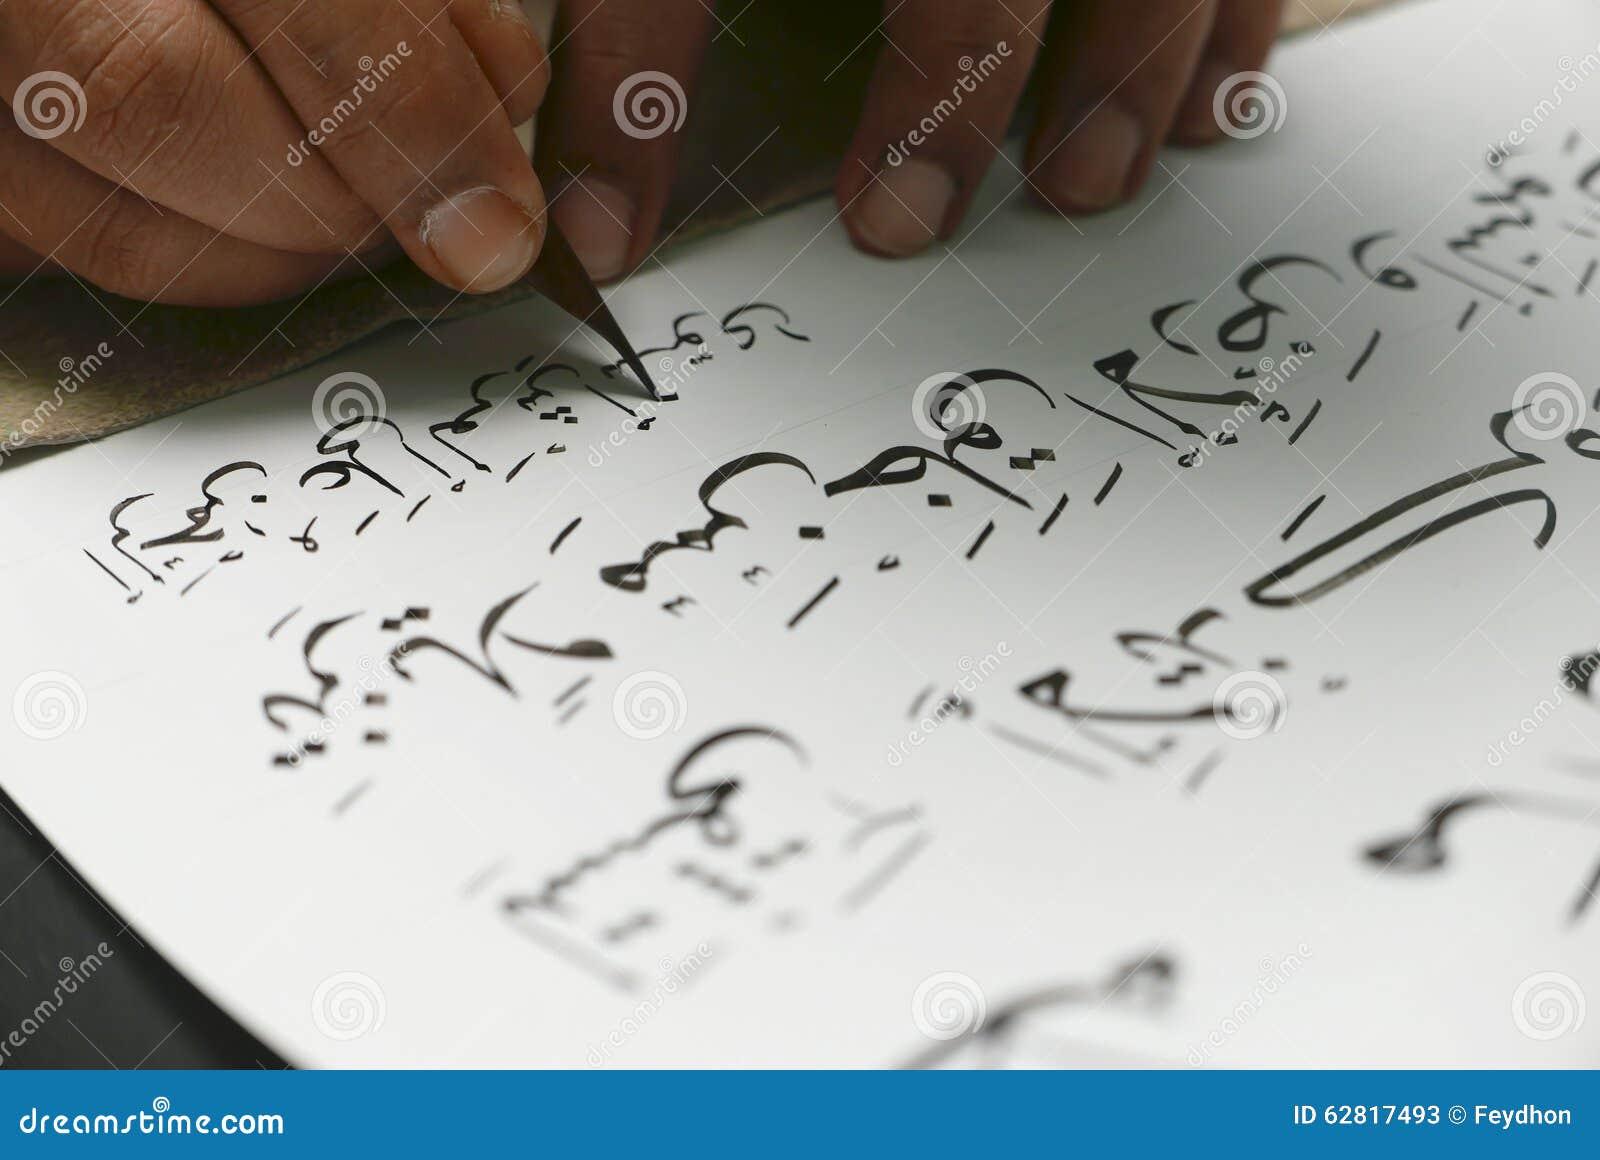 Quranic Calligraphy Transcription On Paper Islamic Sacred